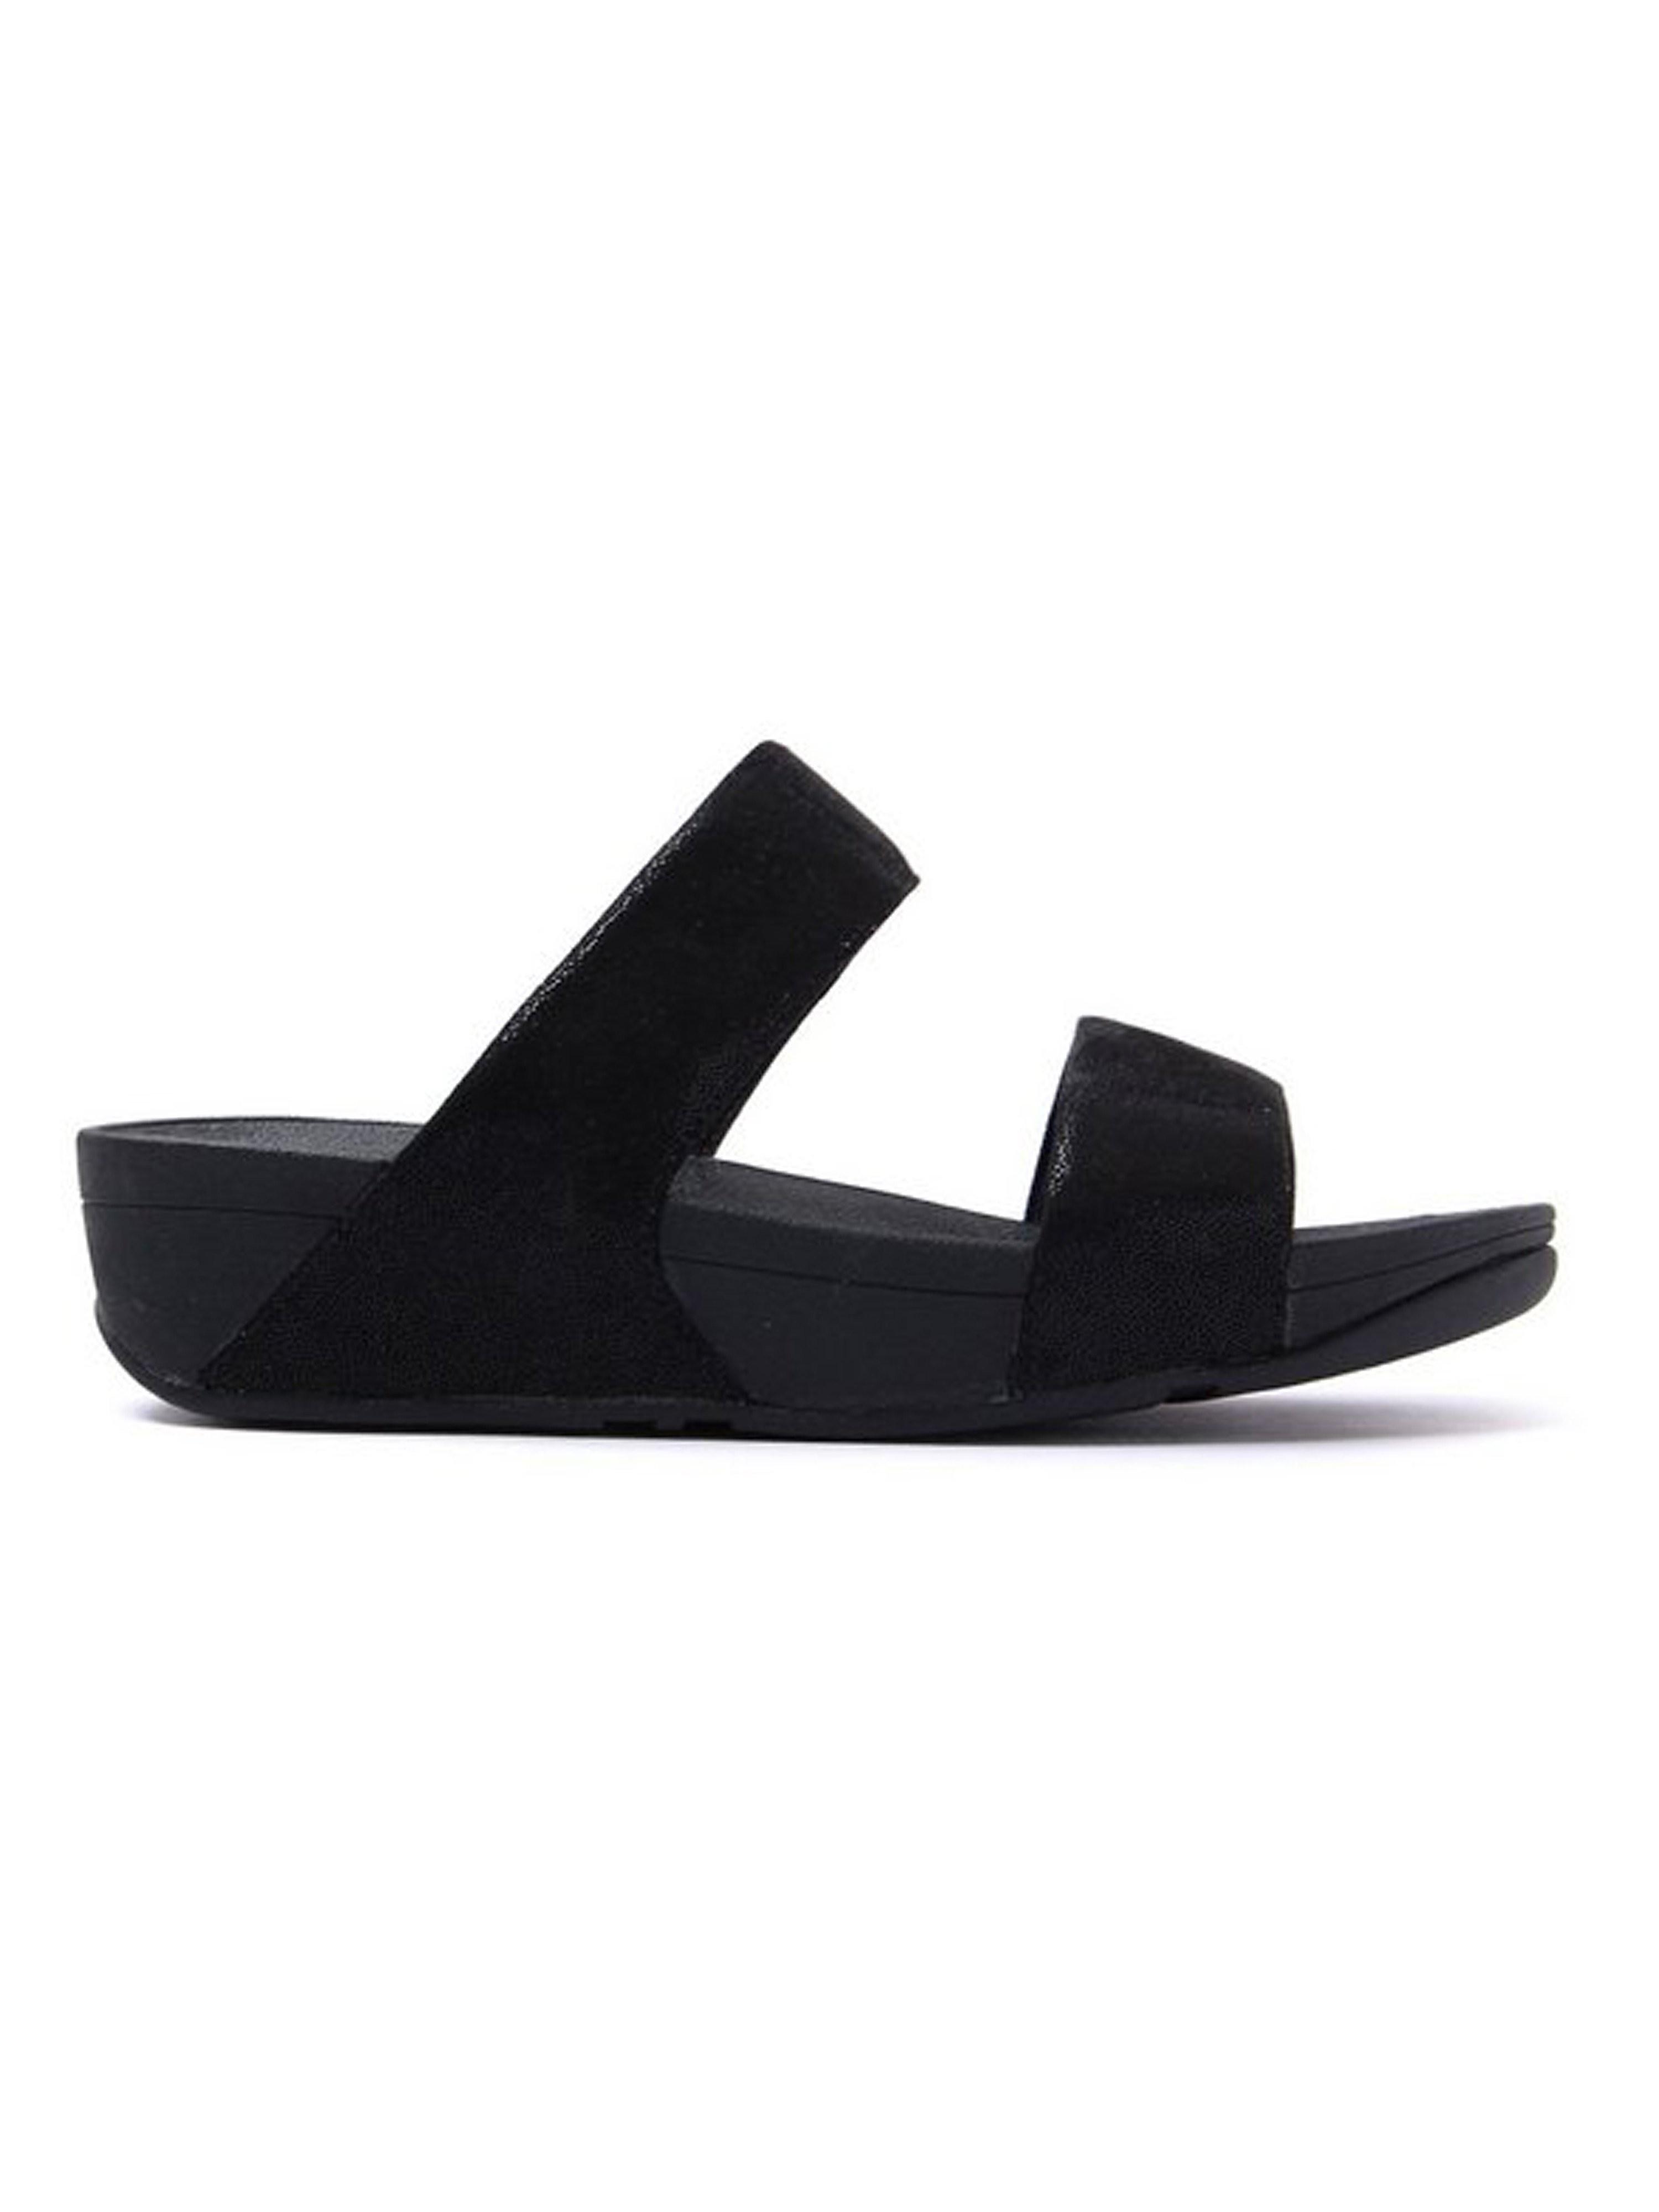 FitFlop Women's Shimmy Suede Slide Sandals - Black Glimmer